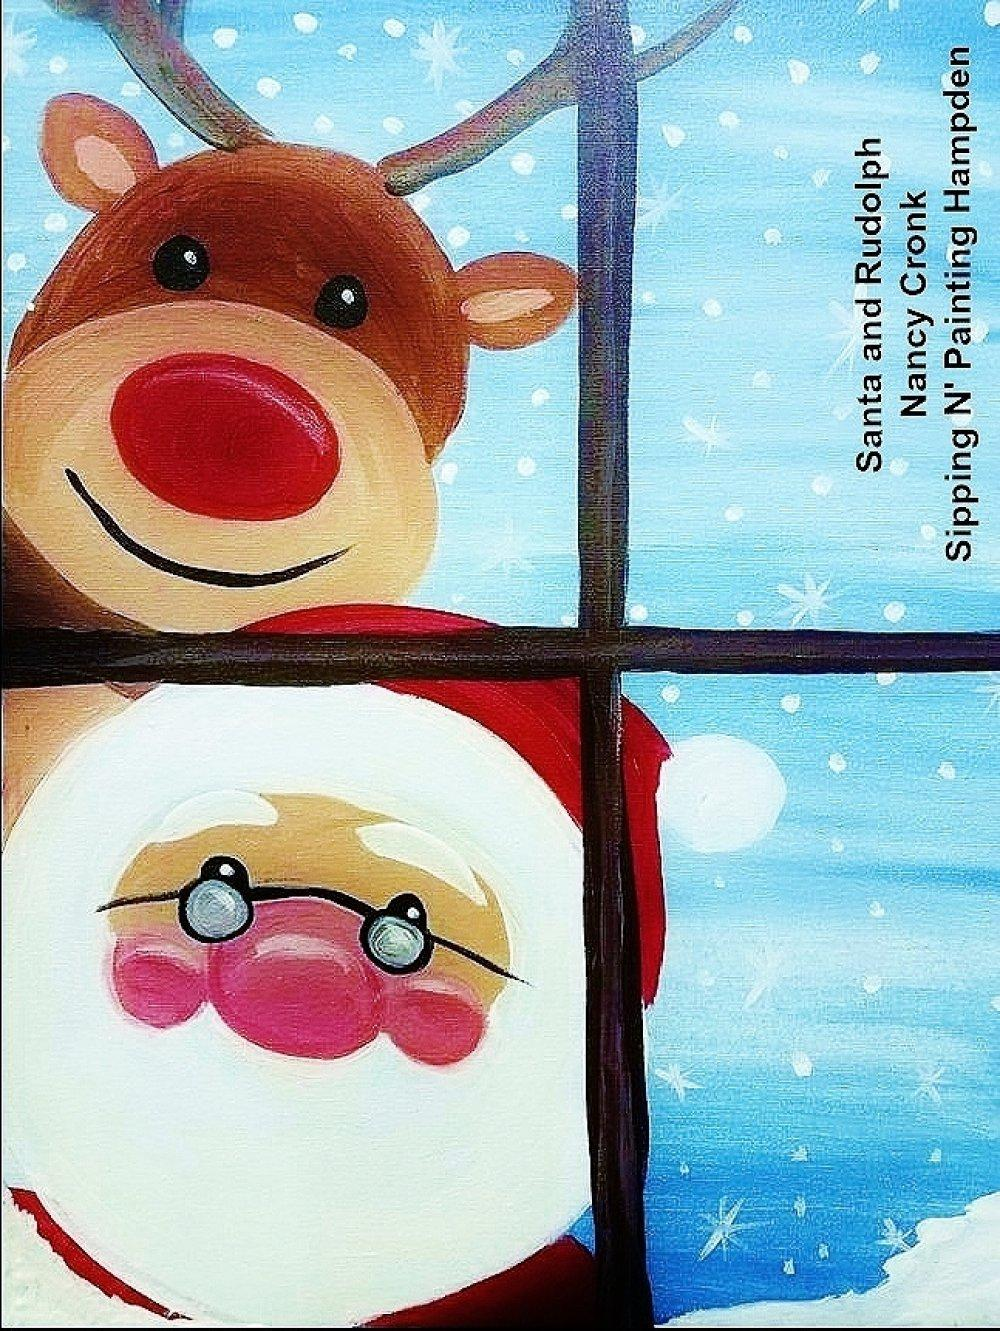 Paint Wine Denver Santa and Rudolph Sun Dec 15th 1:30pm $25